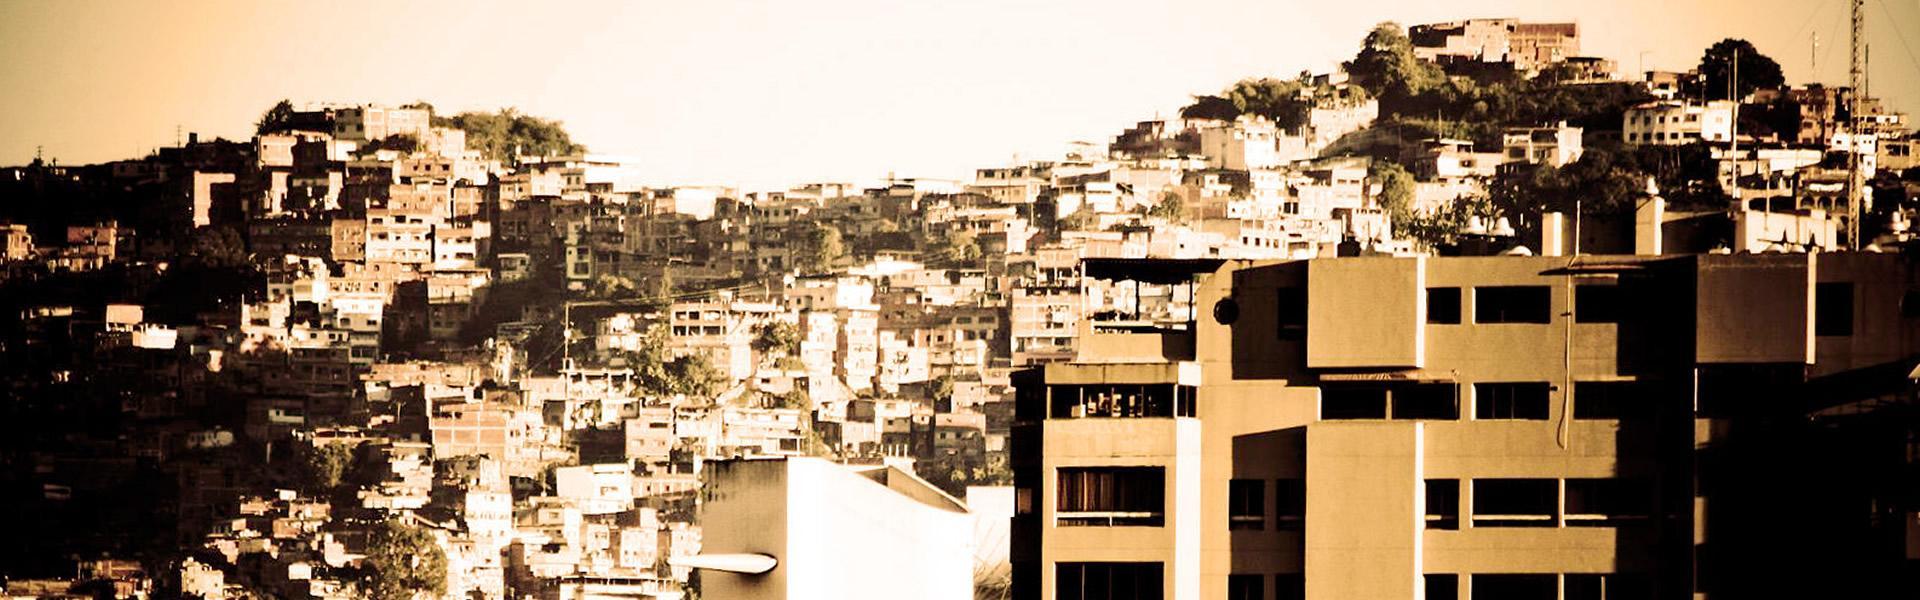 Urbanismo portada